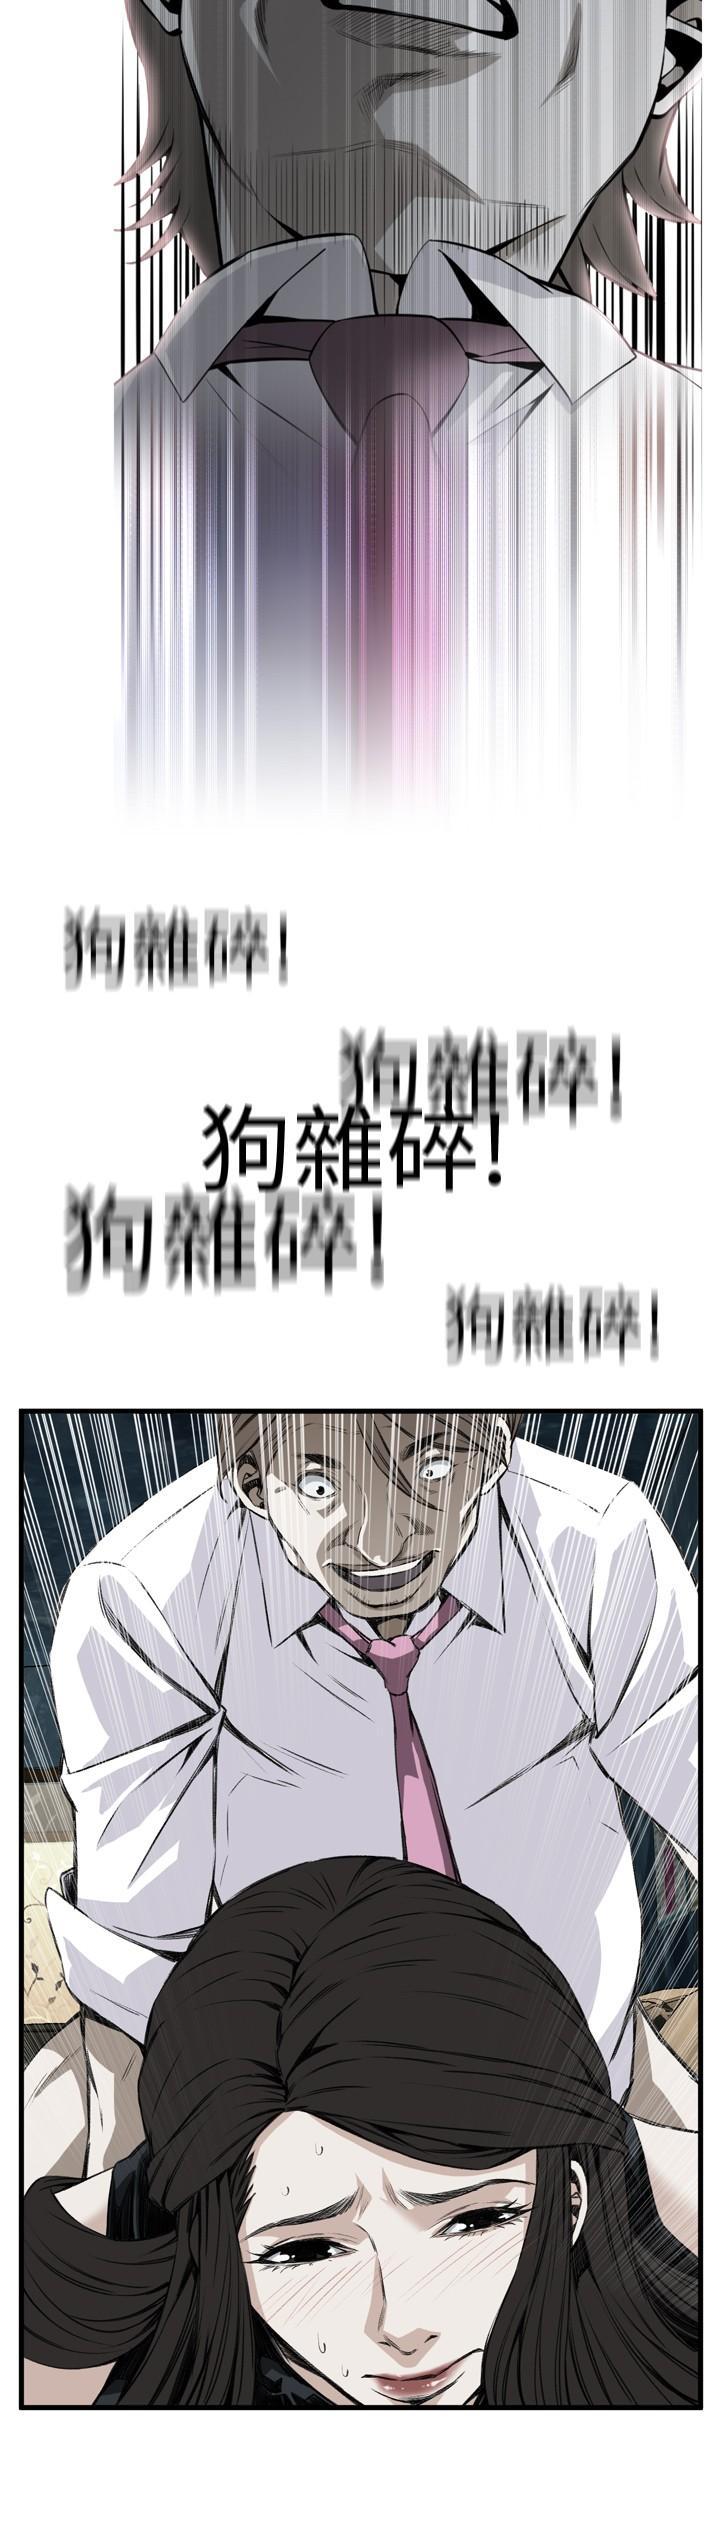 Take a Peek 偷窥 Ch.39~60 [Chinese]中文 189